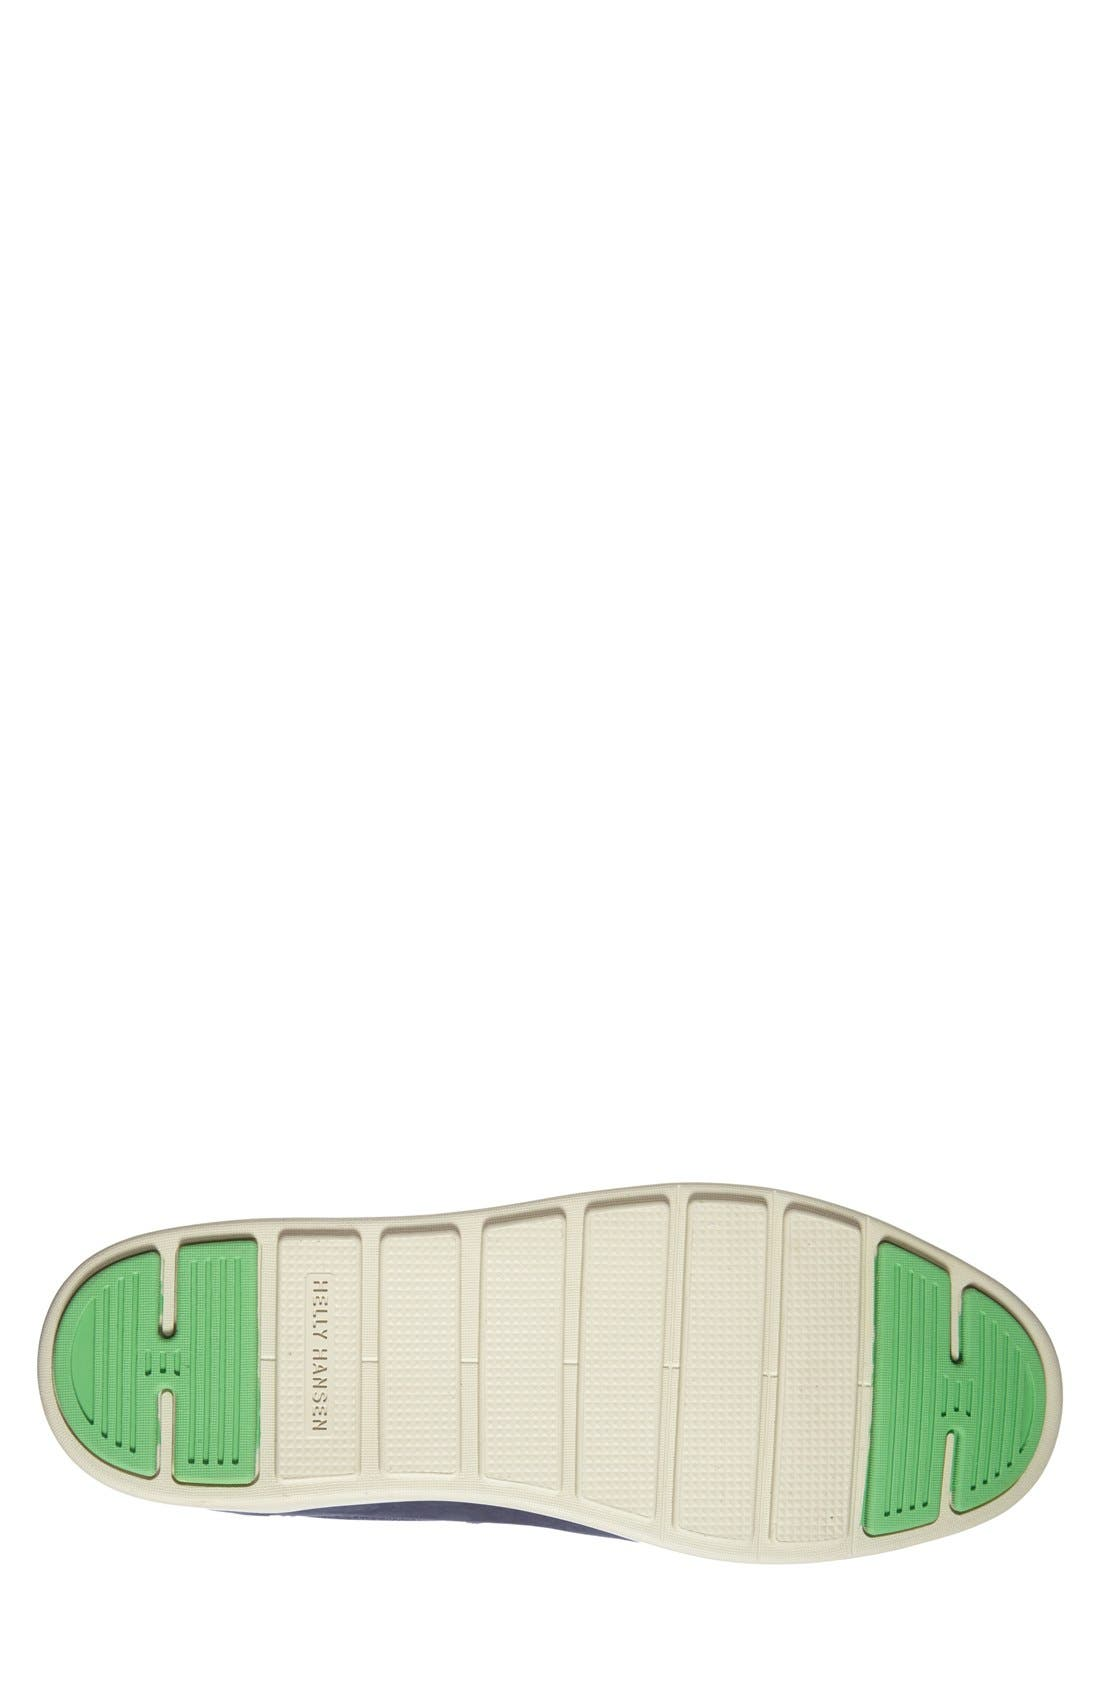 'Stockholm' Waterproof High Top Sneaker,                             Alternate thumbnail 4, color,                             489